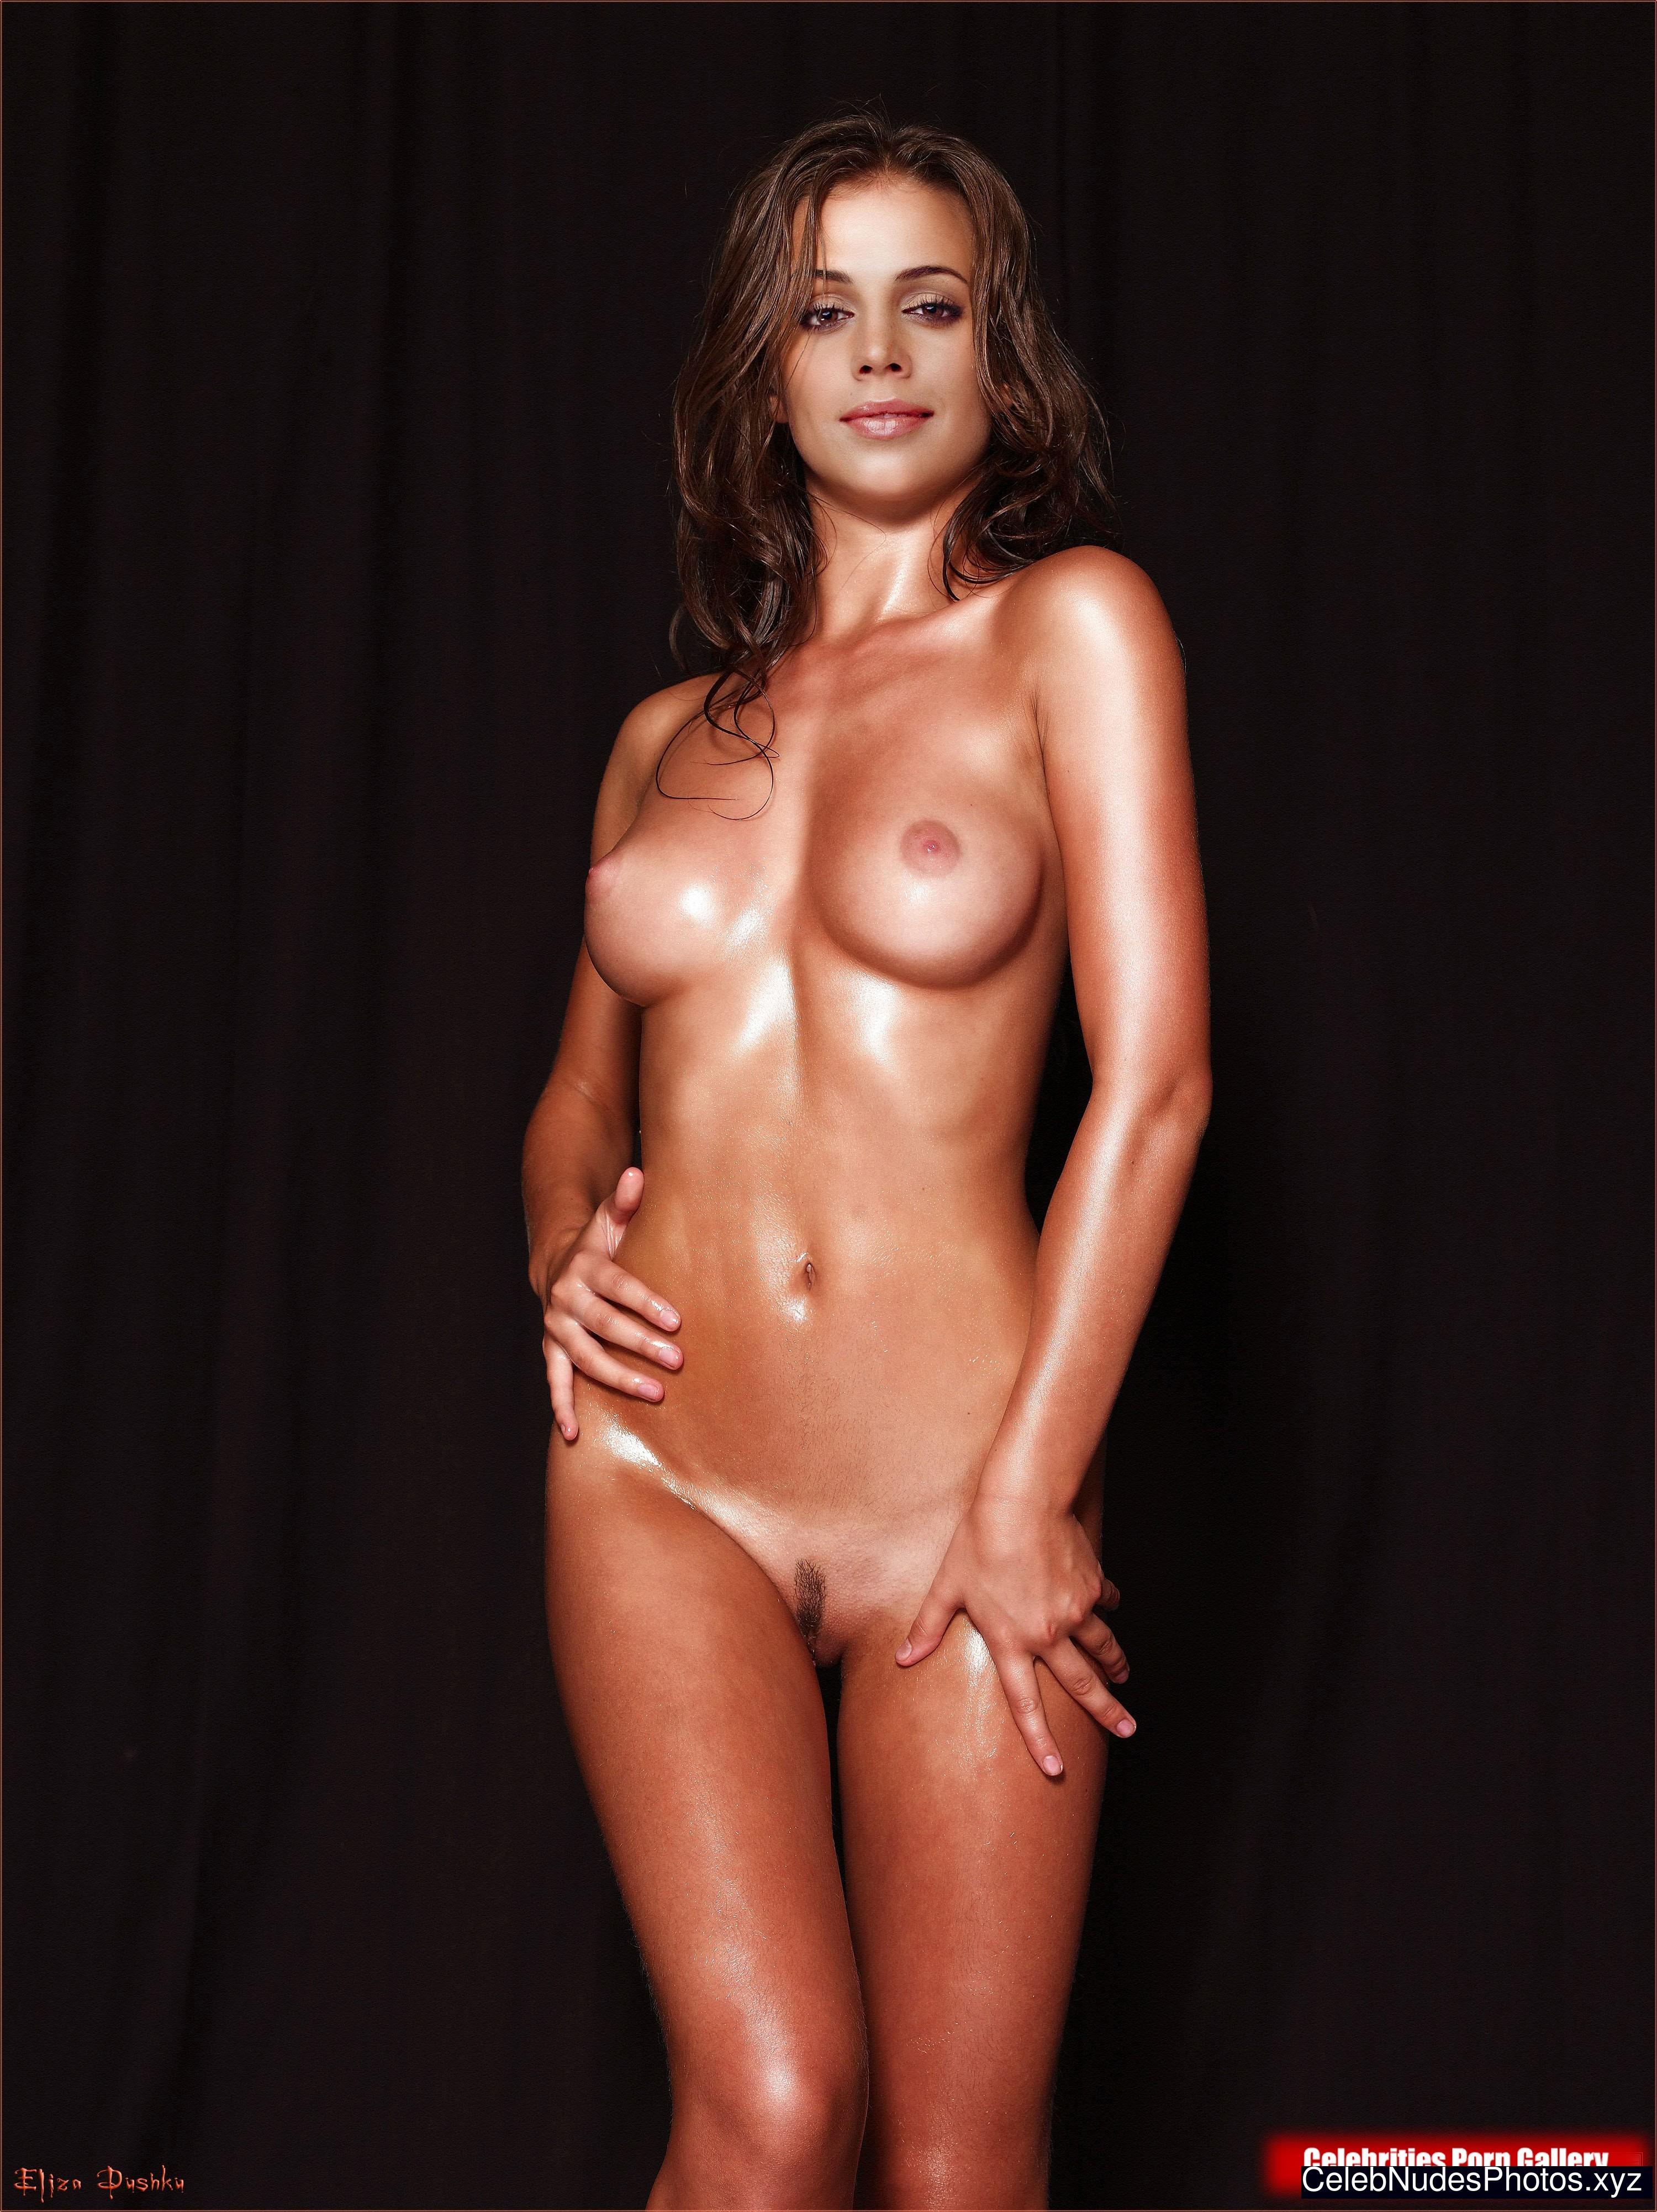 Babe with perky nipples and big tits tmb